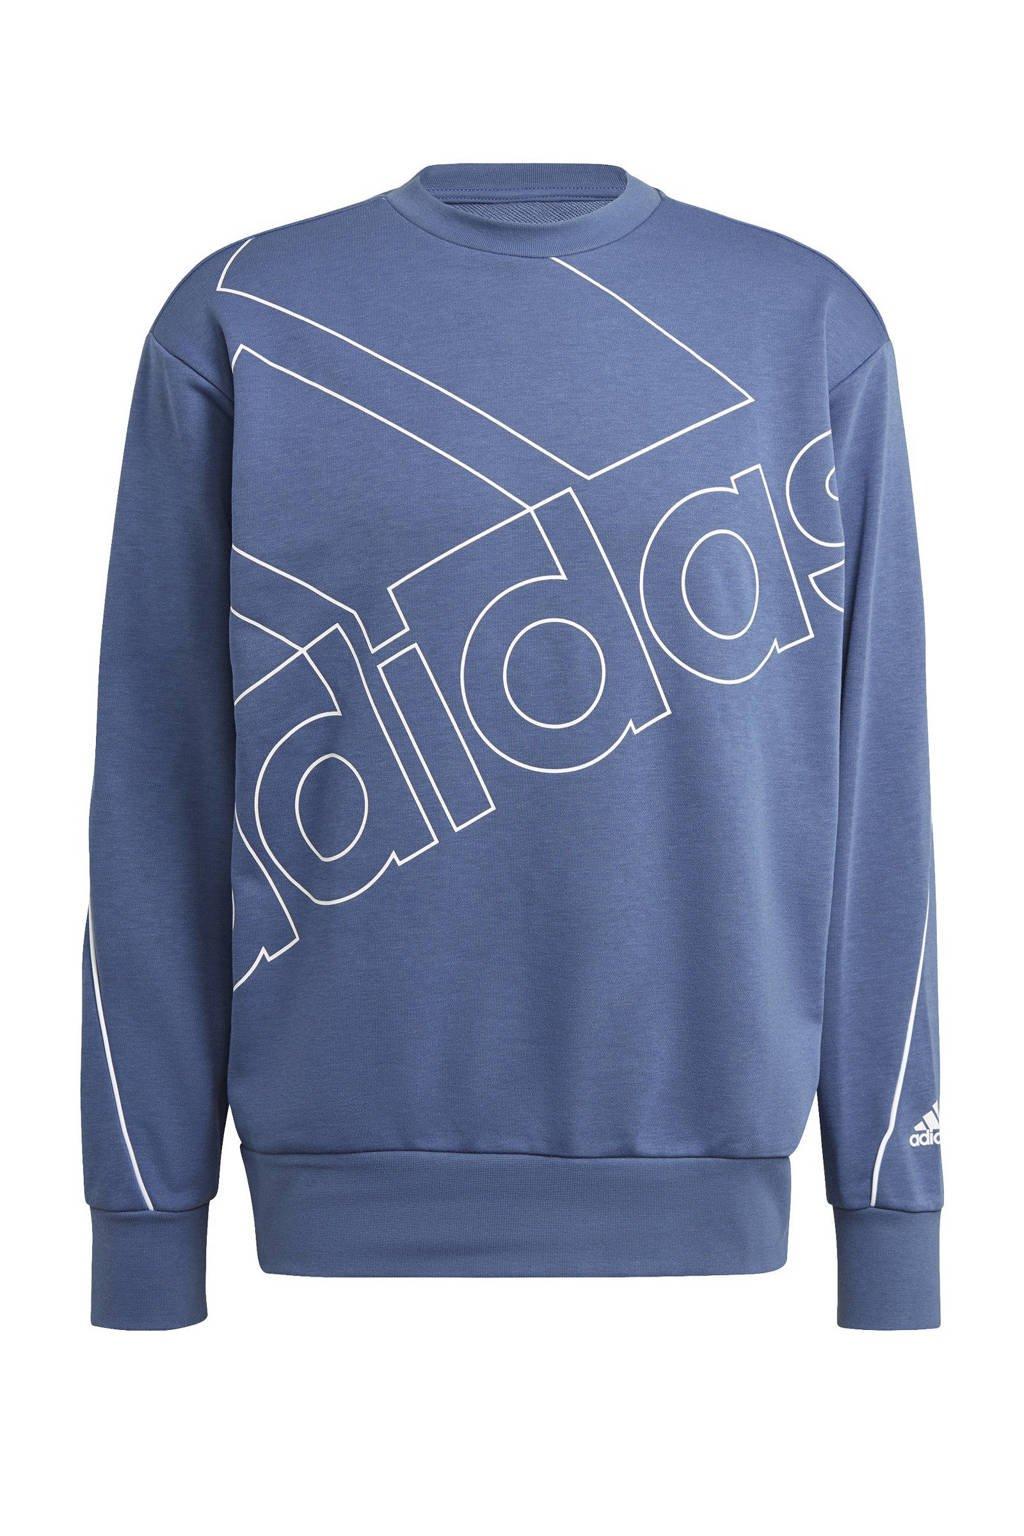 adidas Performance   sportsweater blauw, Blauw/wit